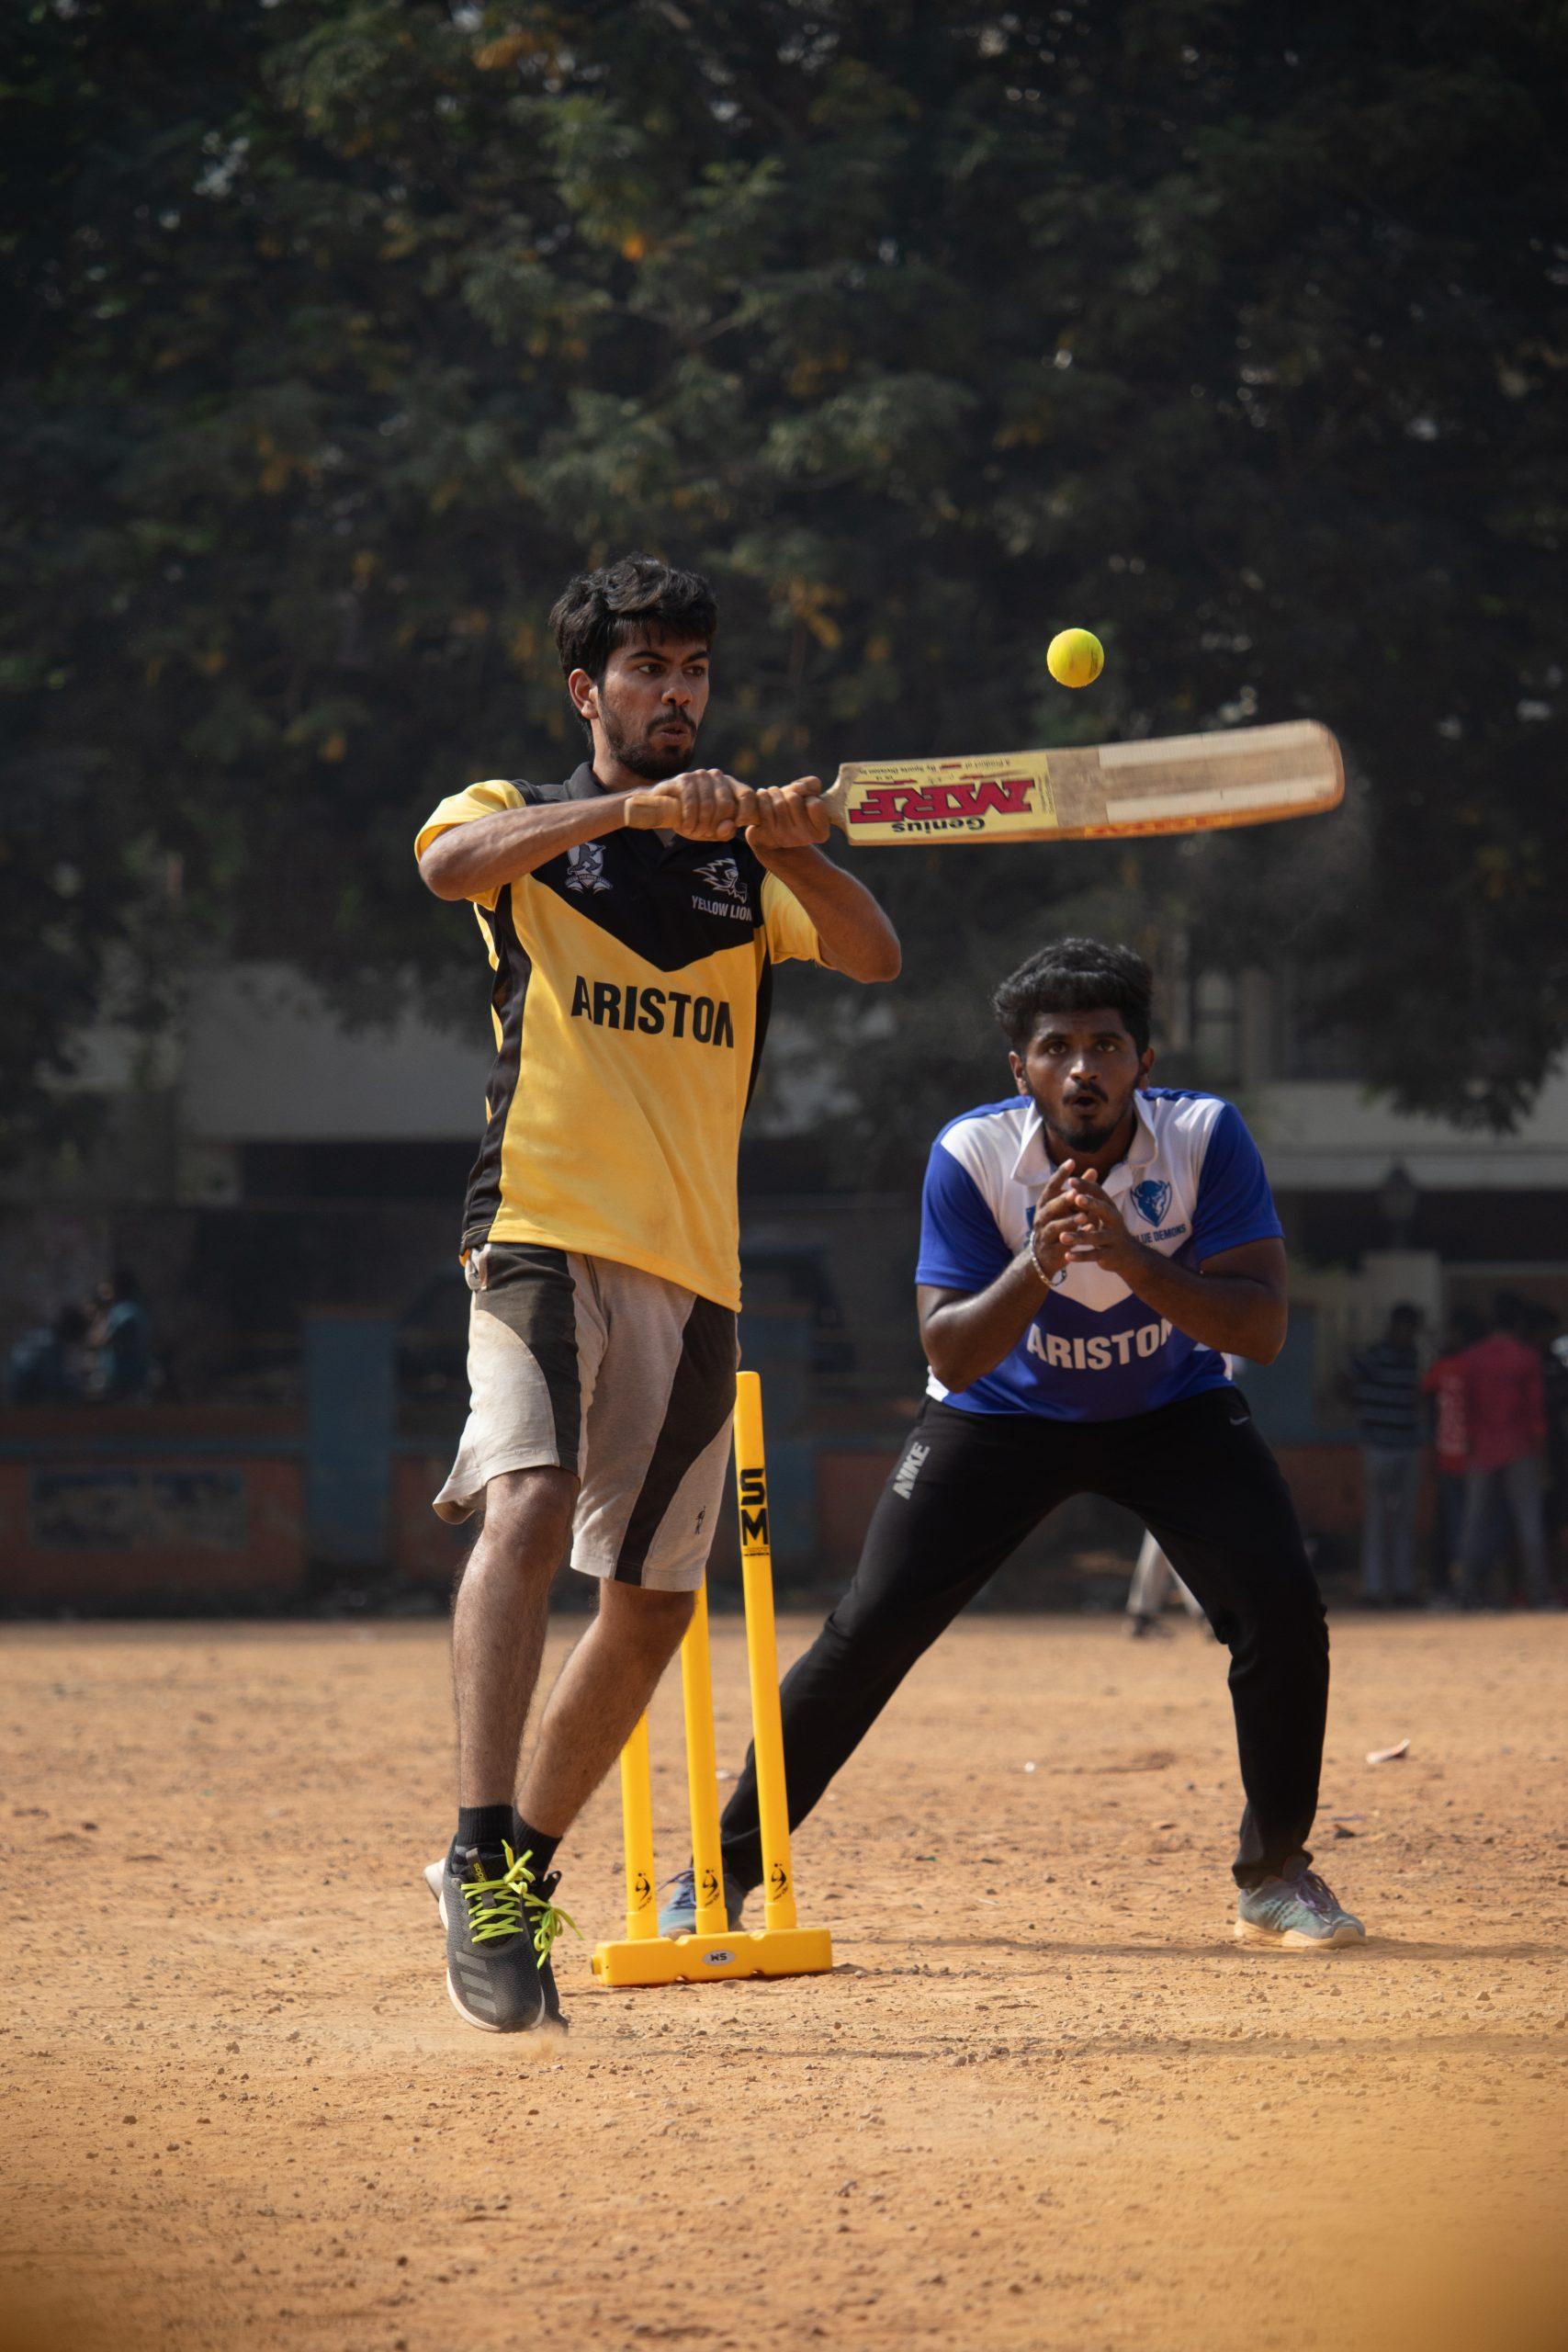 batsman hitting his shot